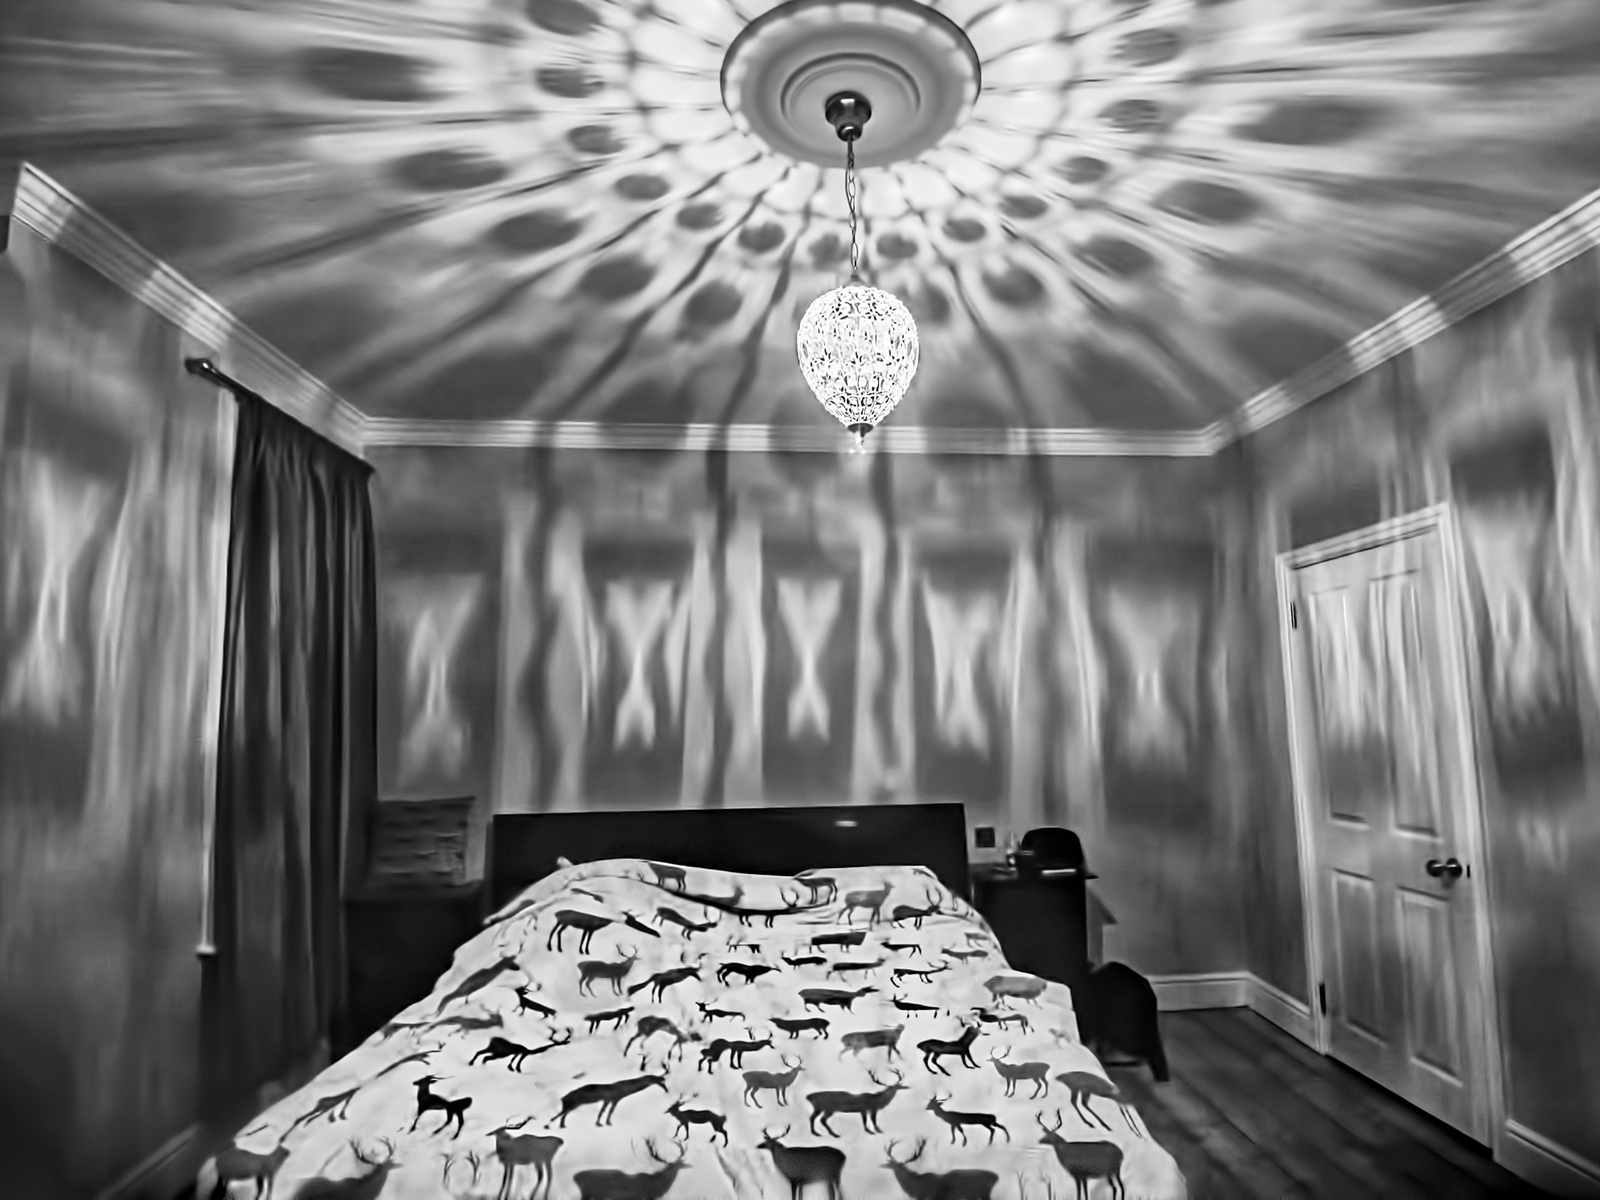 Pam Sherren_Casting Bedroom Shadows_None